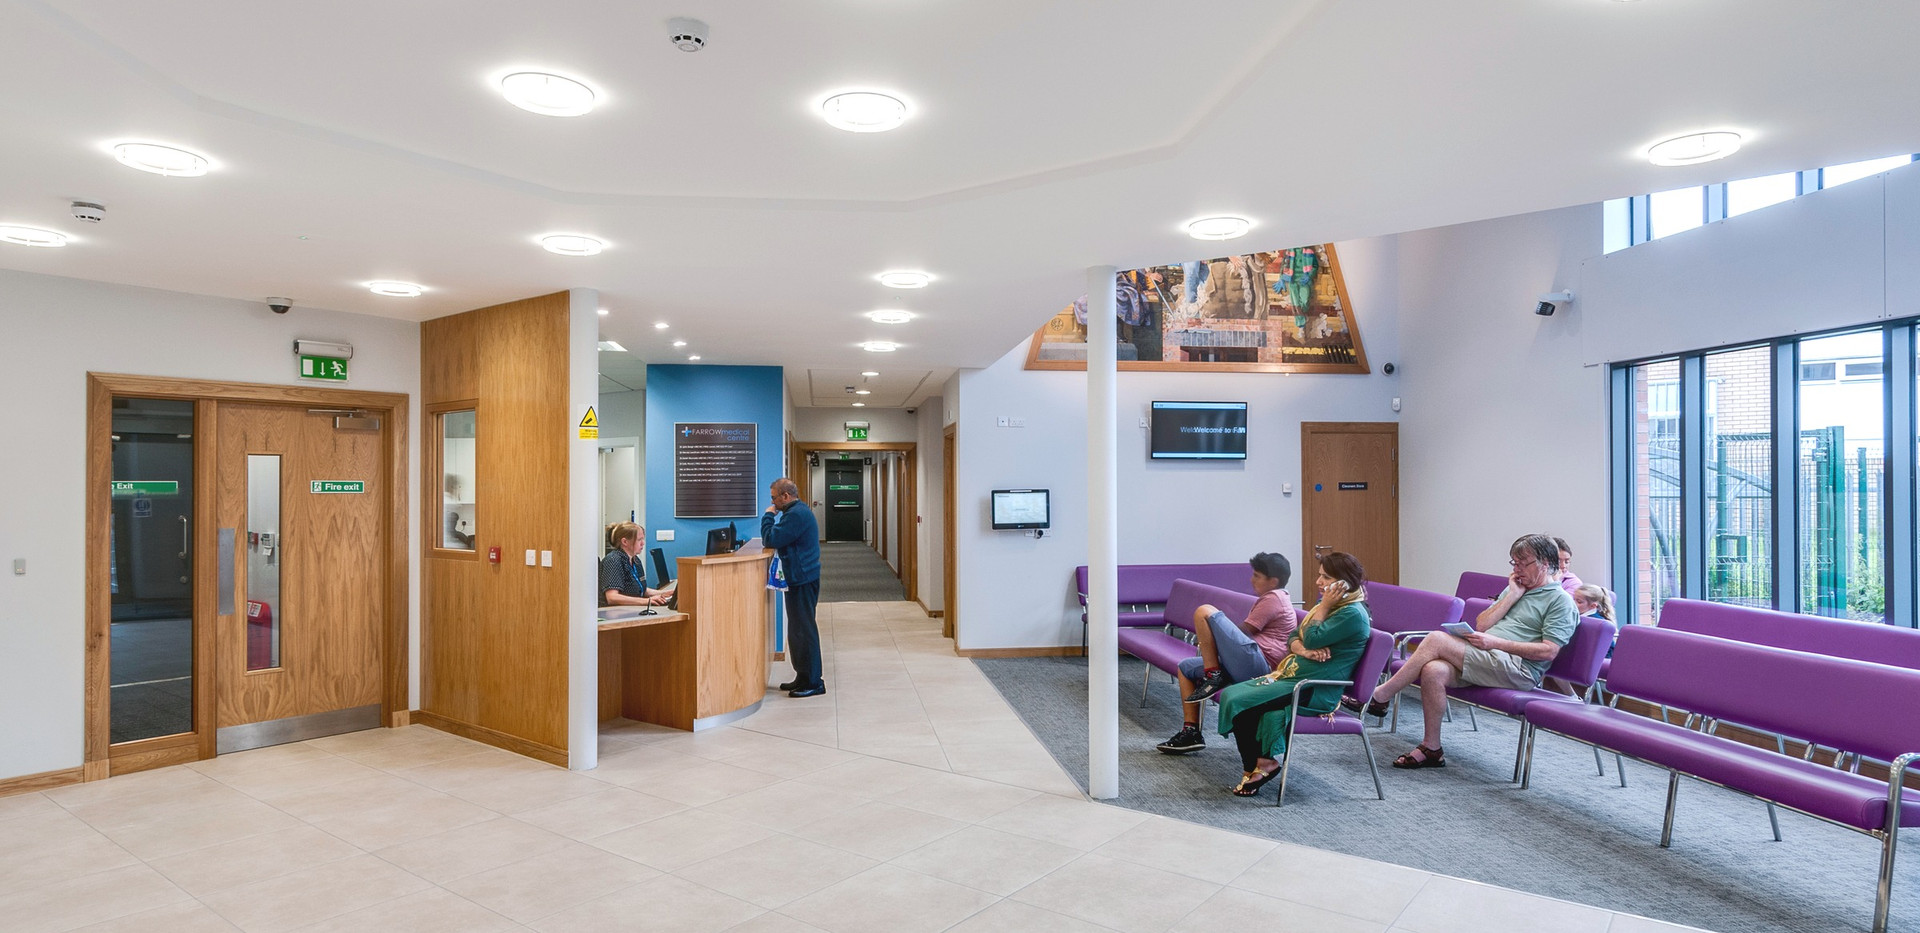 P035 Farrow Medical Waiting Room